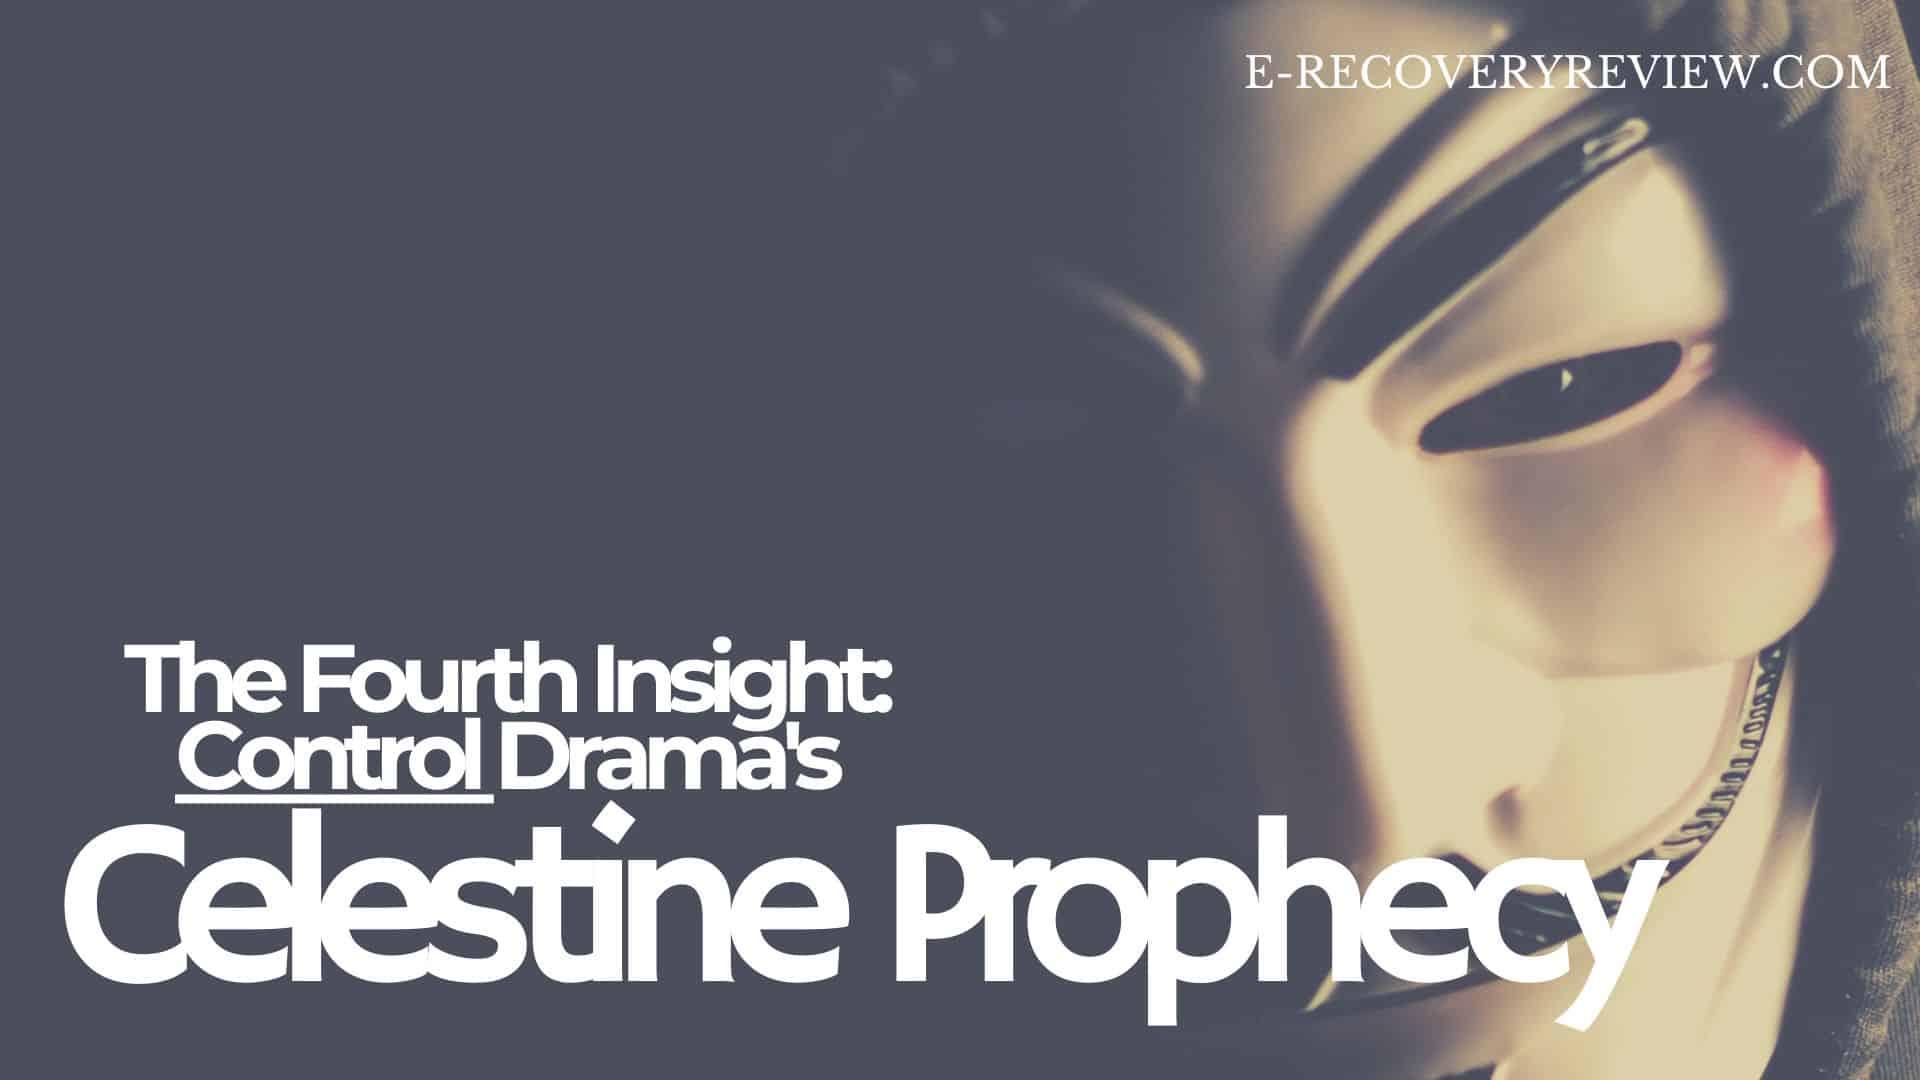 control dramas 2 celestine prophecy insights